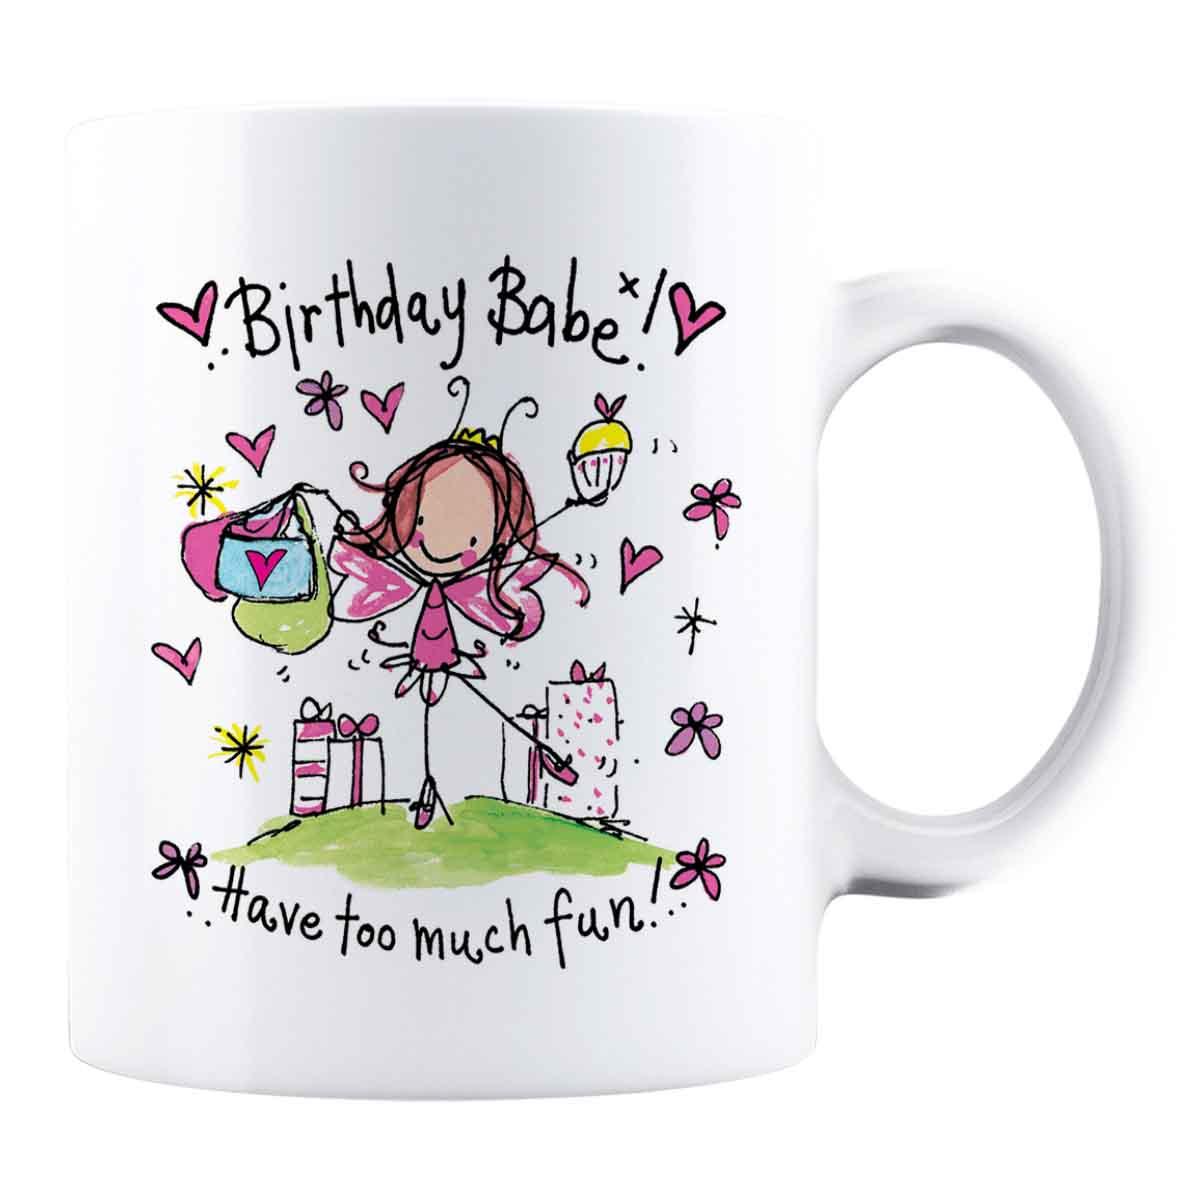 Cană personalizată - Birthday Babe